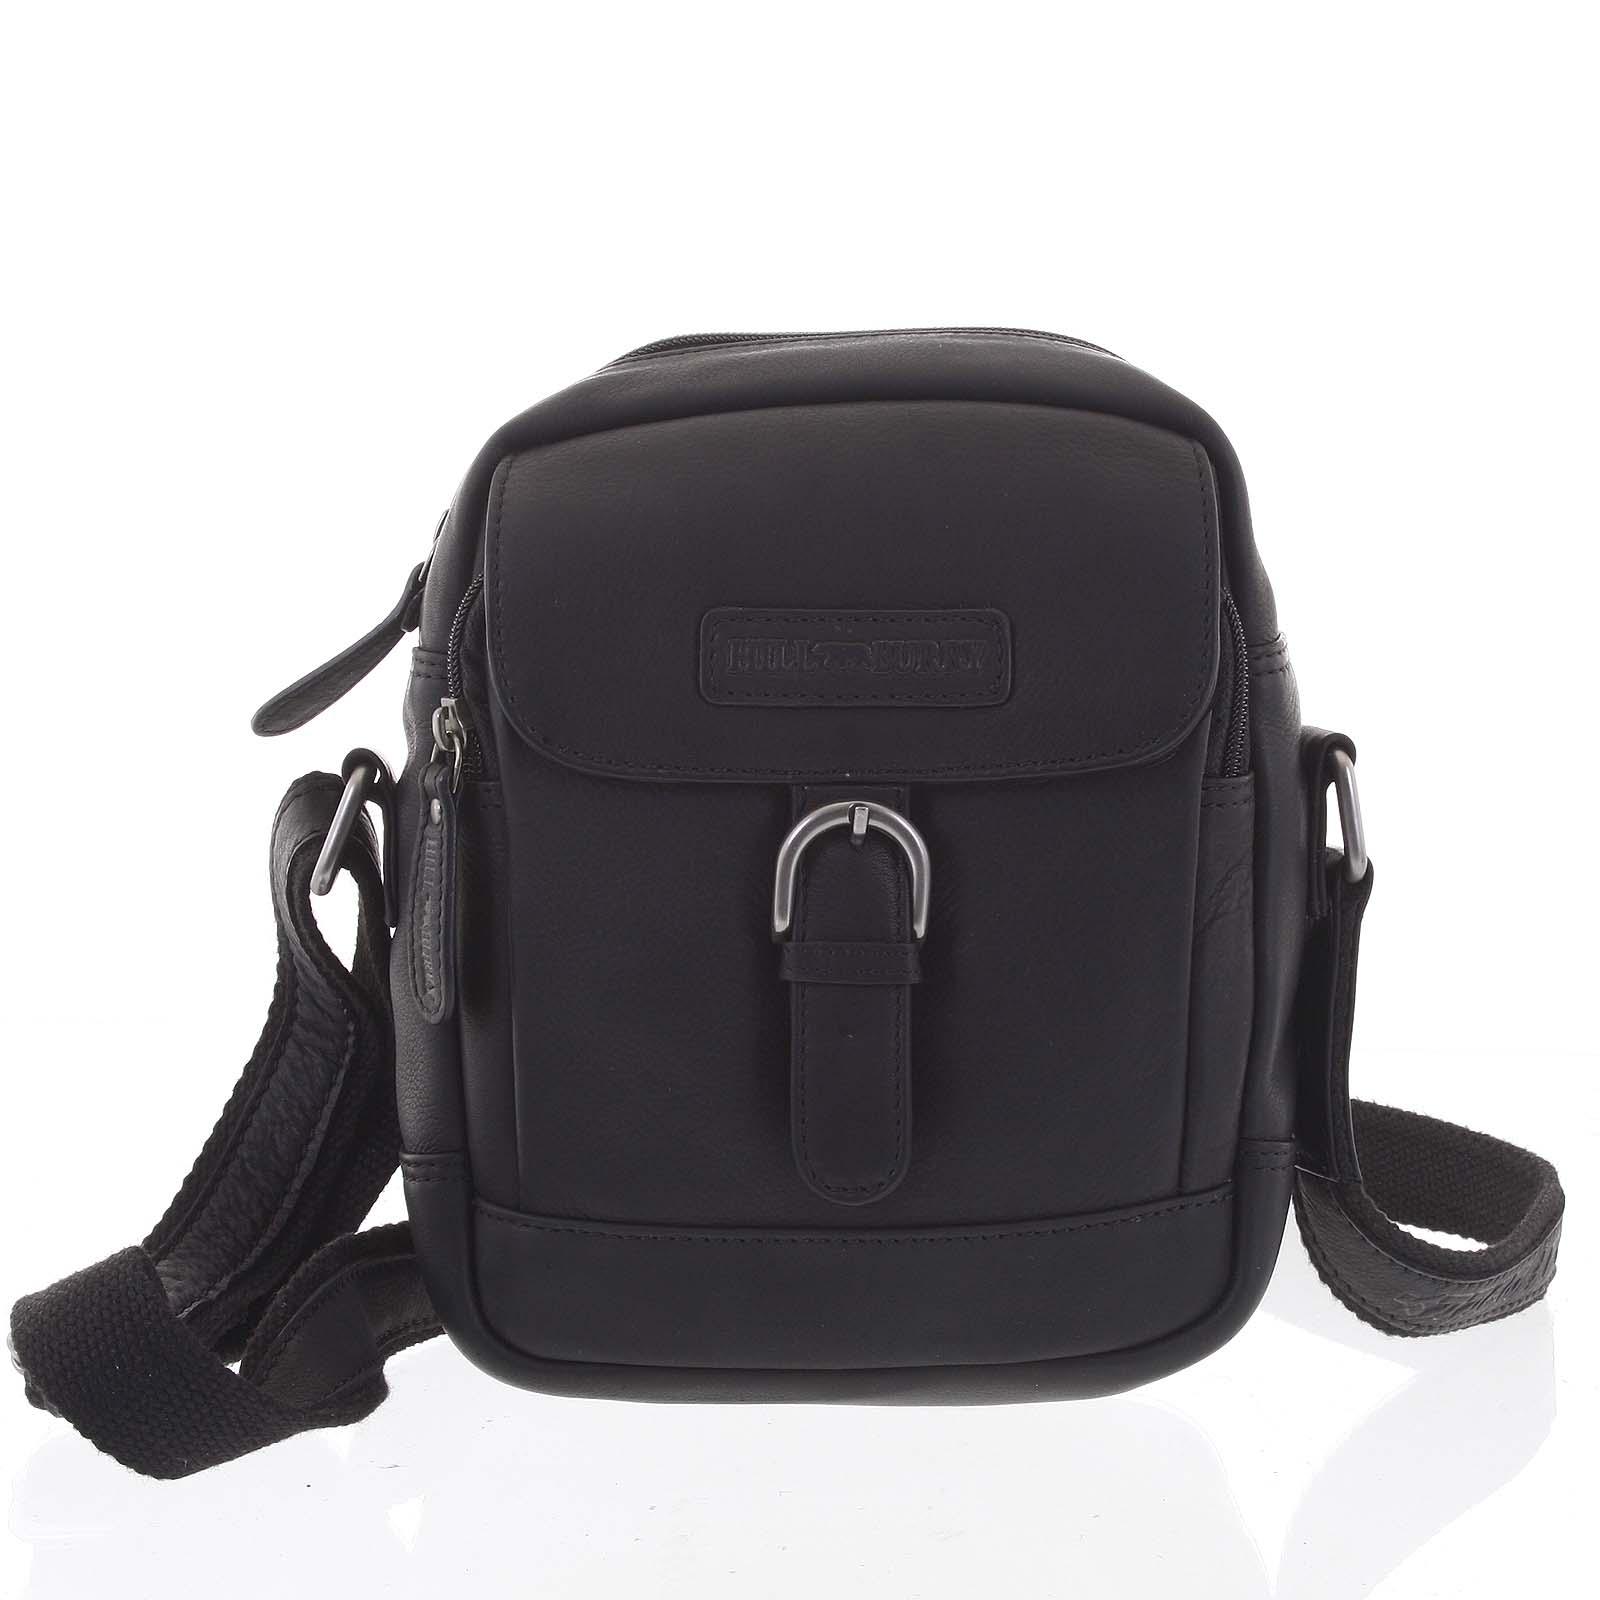 Luxusná kožená taška čierna - Hill Burry Lorst